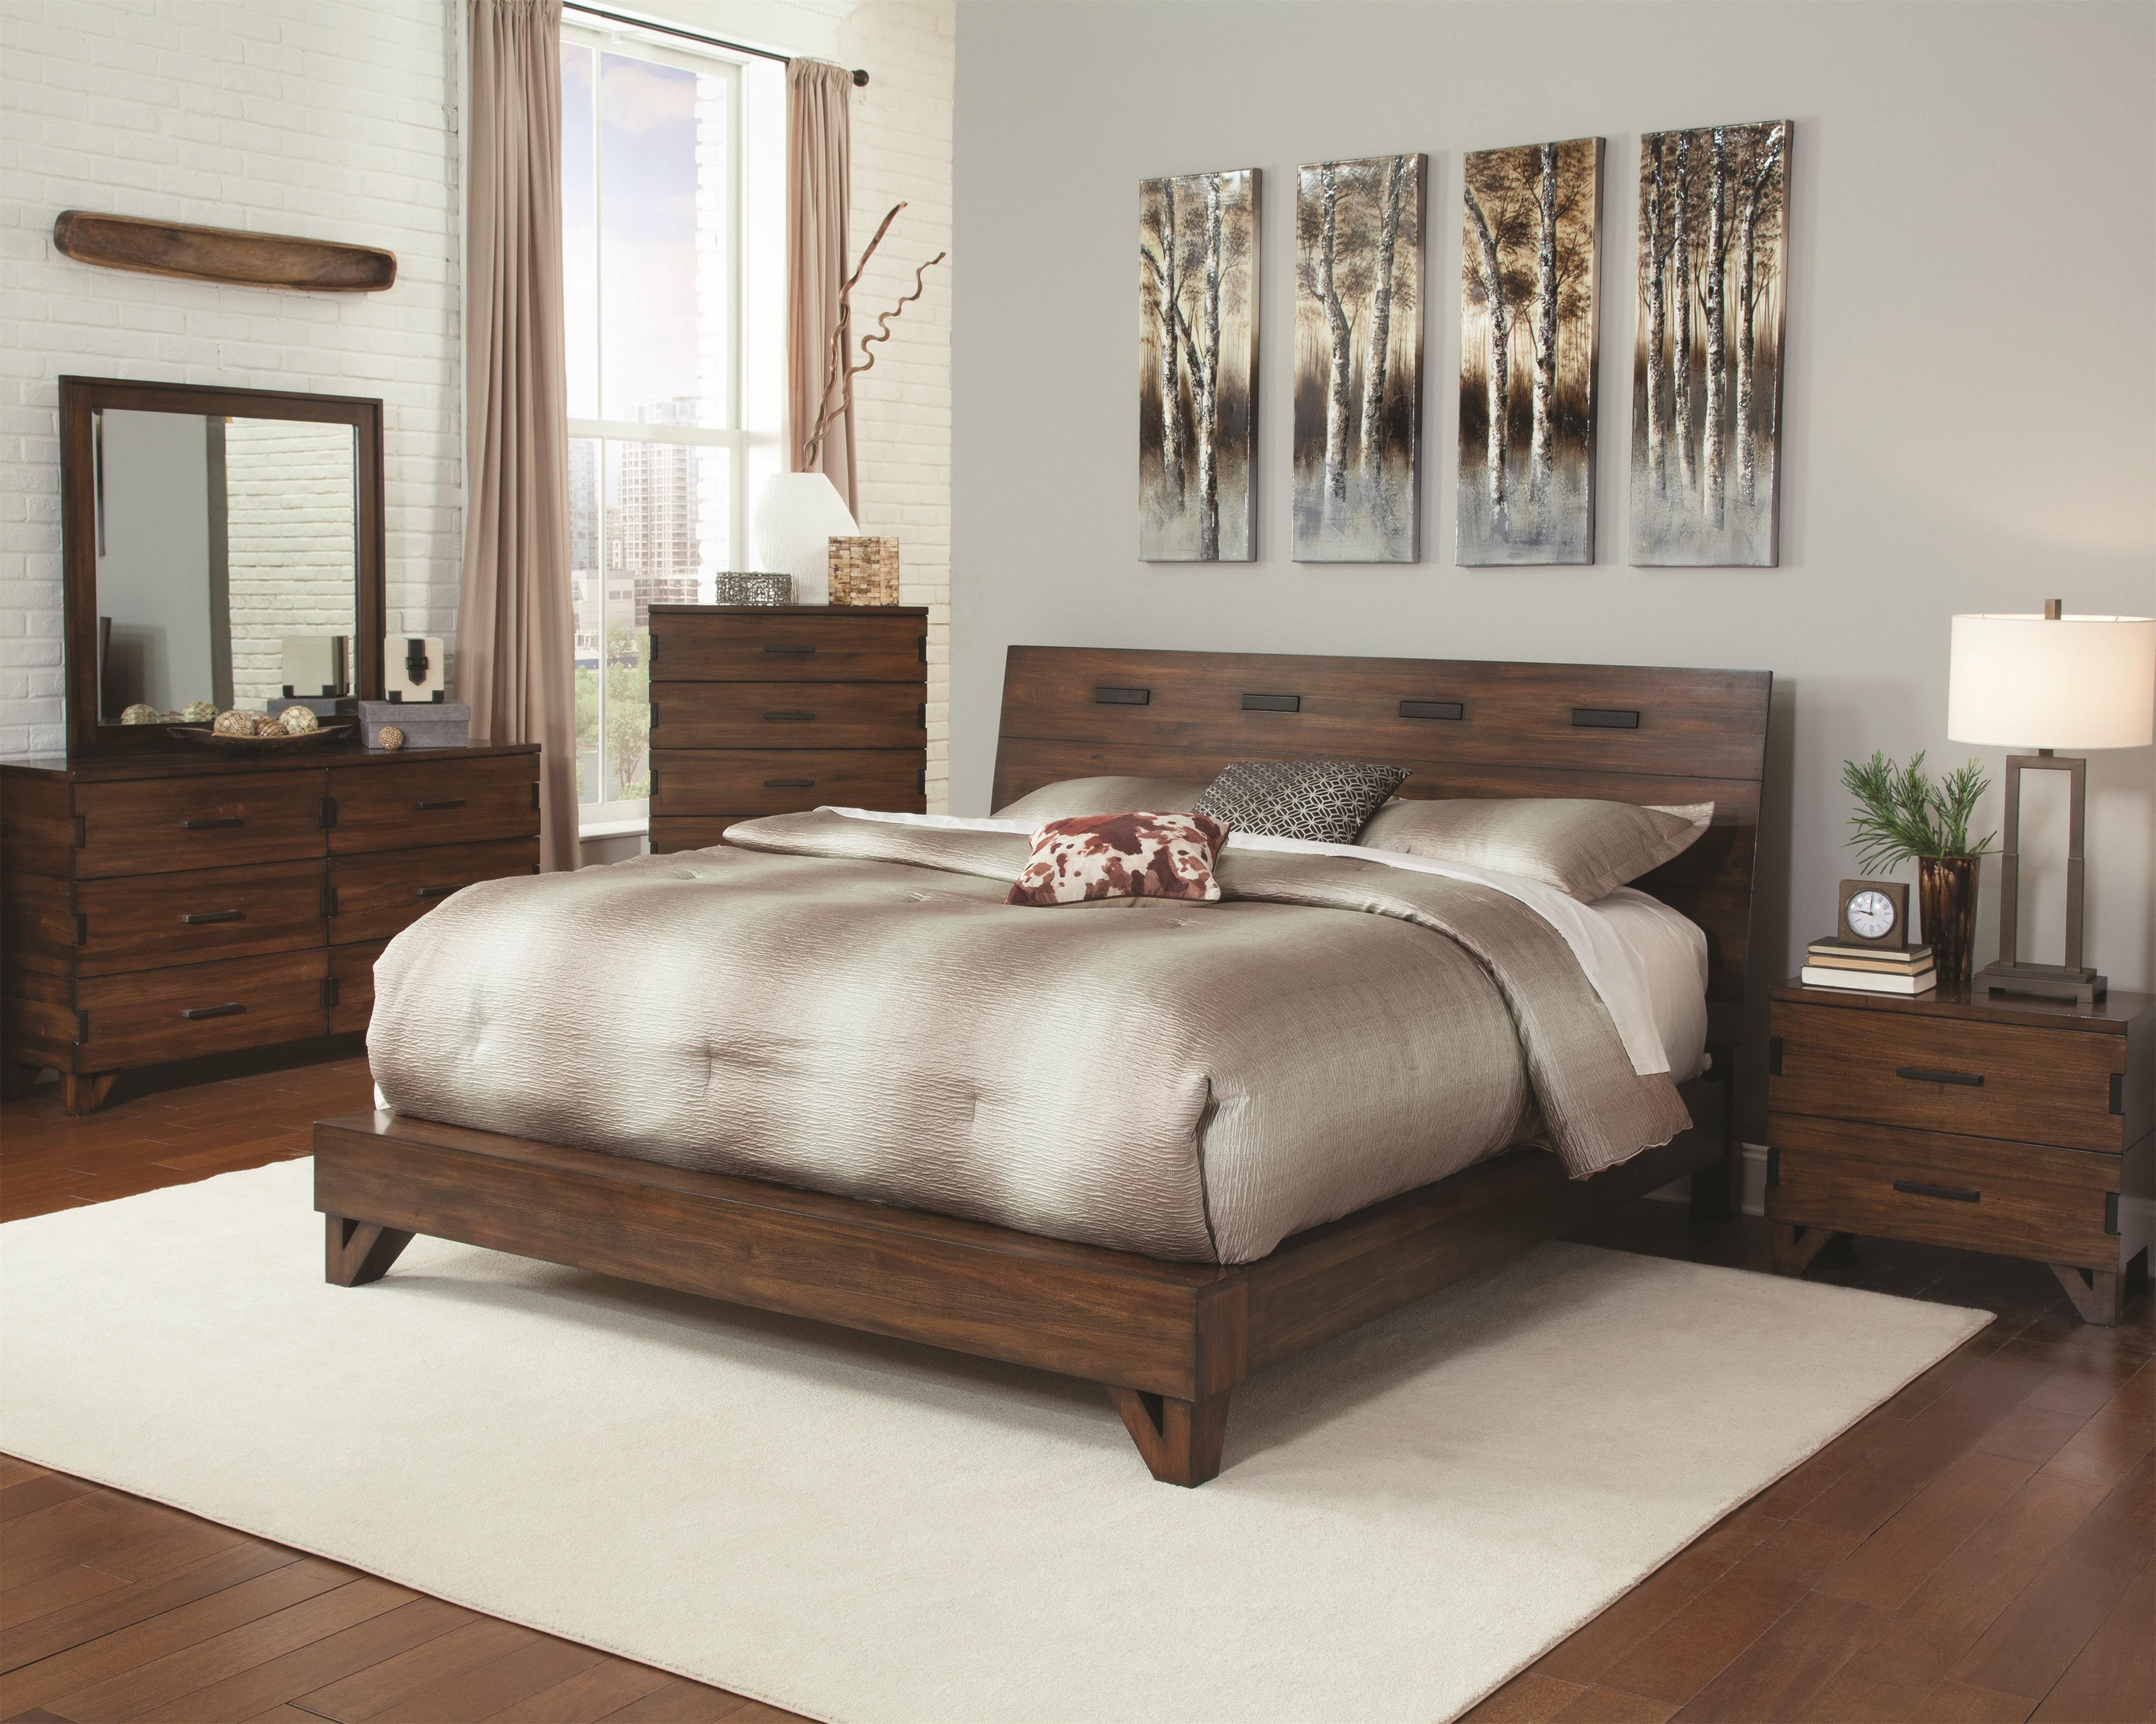 Coaster Yorkshire Queen Bedroom Group - Item Number: 20485 Q Bedroom Group 1